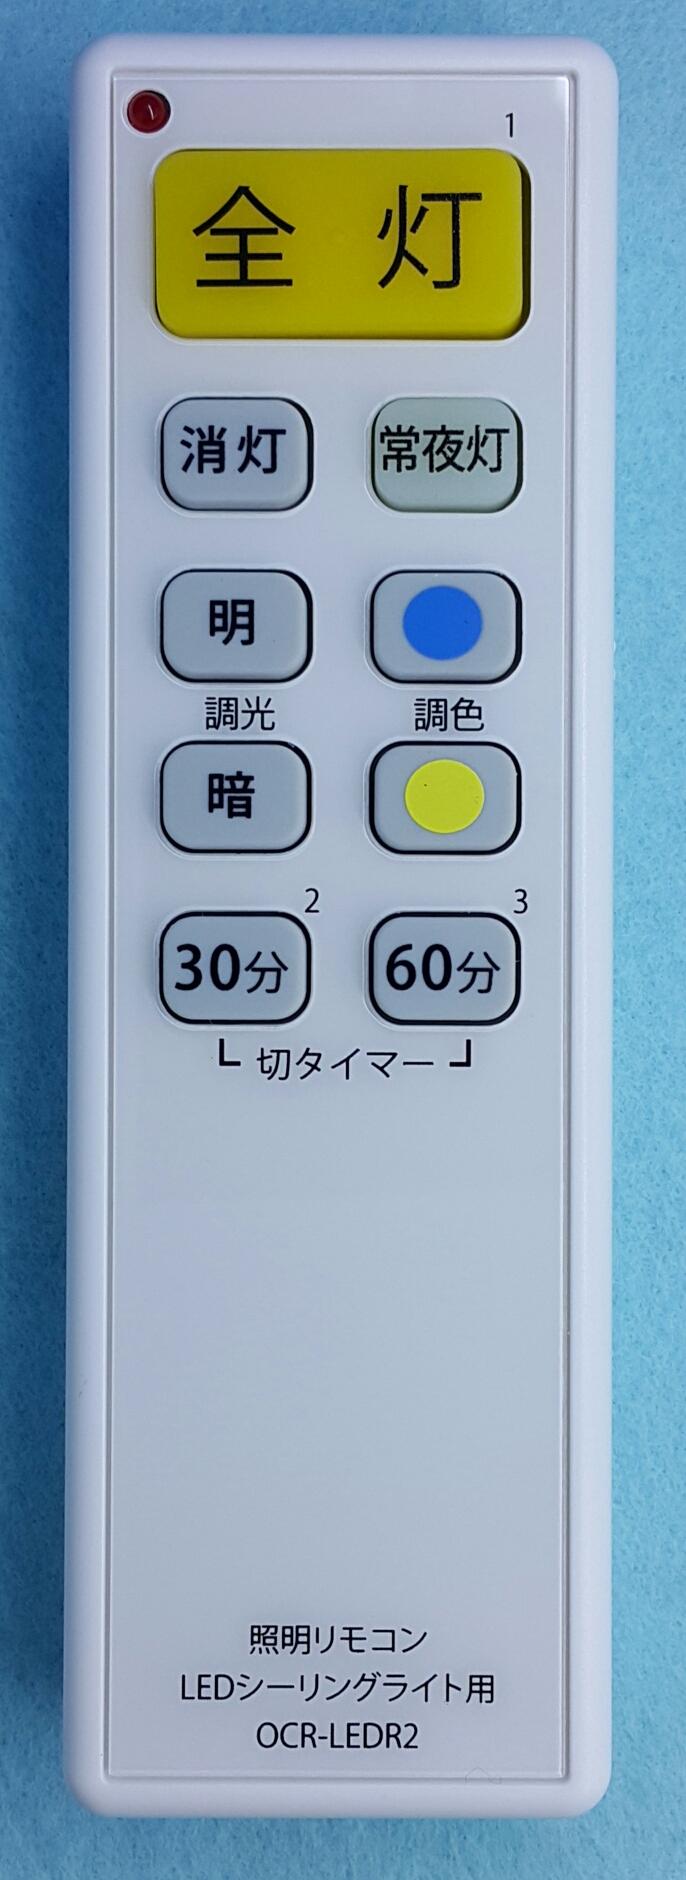 KOIZUMI_OCR-LEDR2_1213_L0176 F00F_LAMP_cover.png